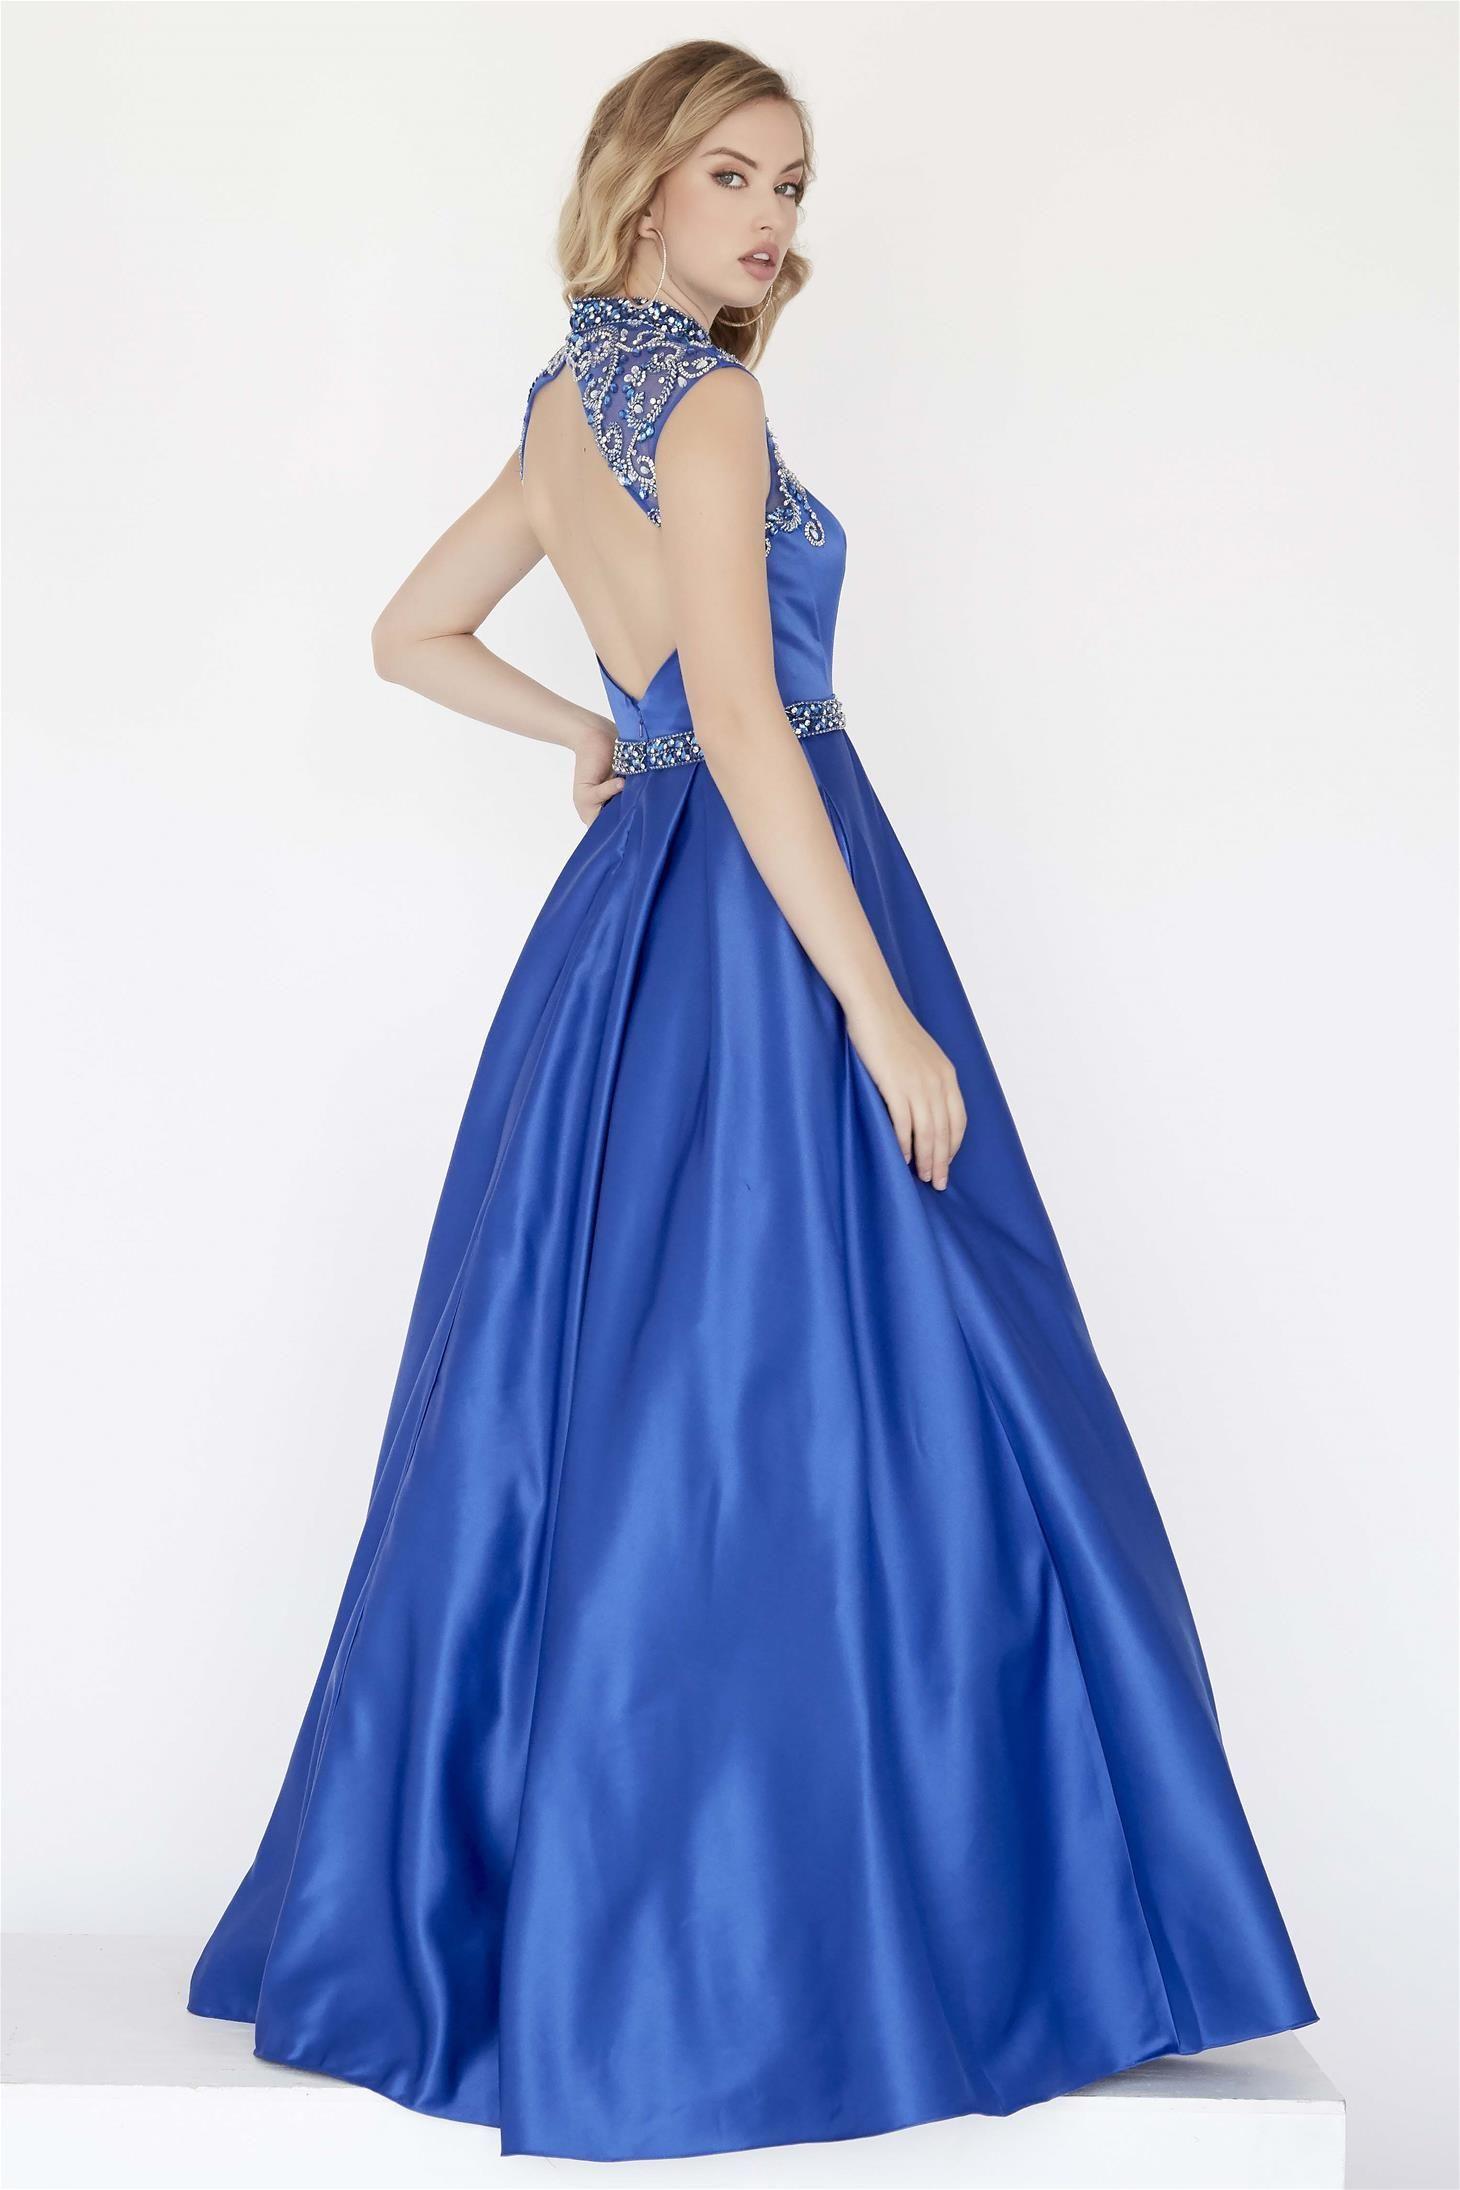 A royal ball gown   Bride\'s Shoppe Prom 2018   Pinterest   Ball ...